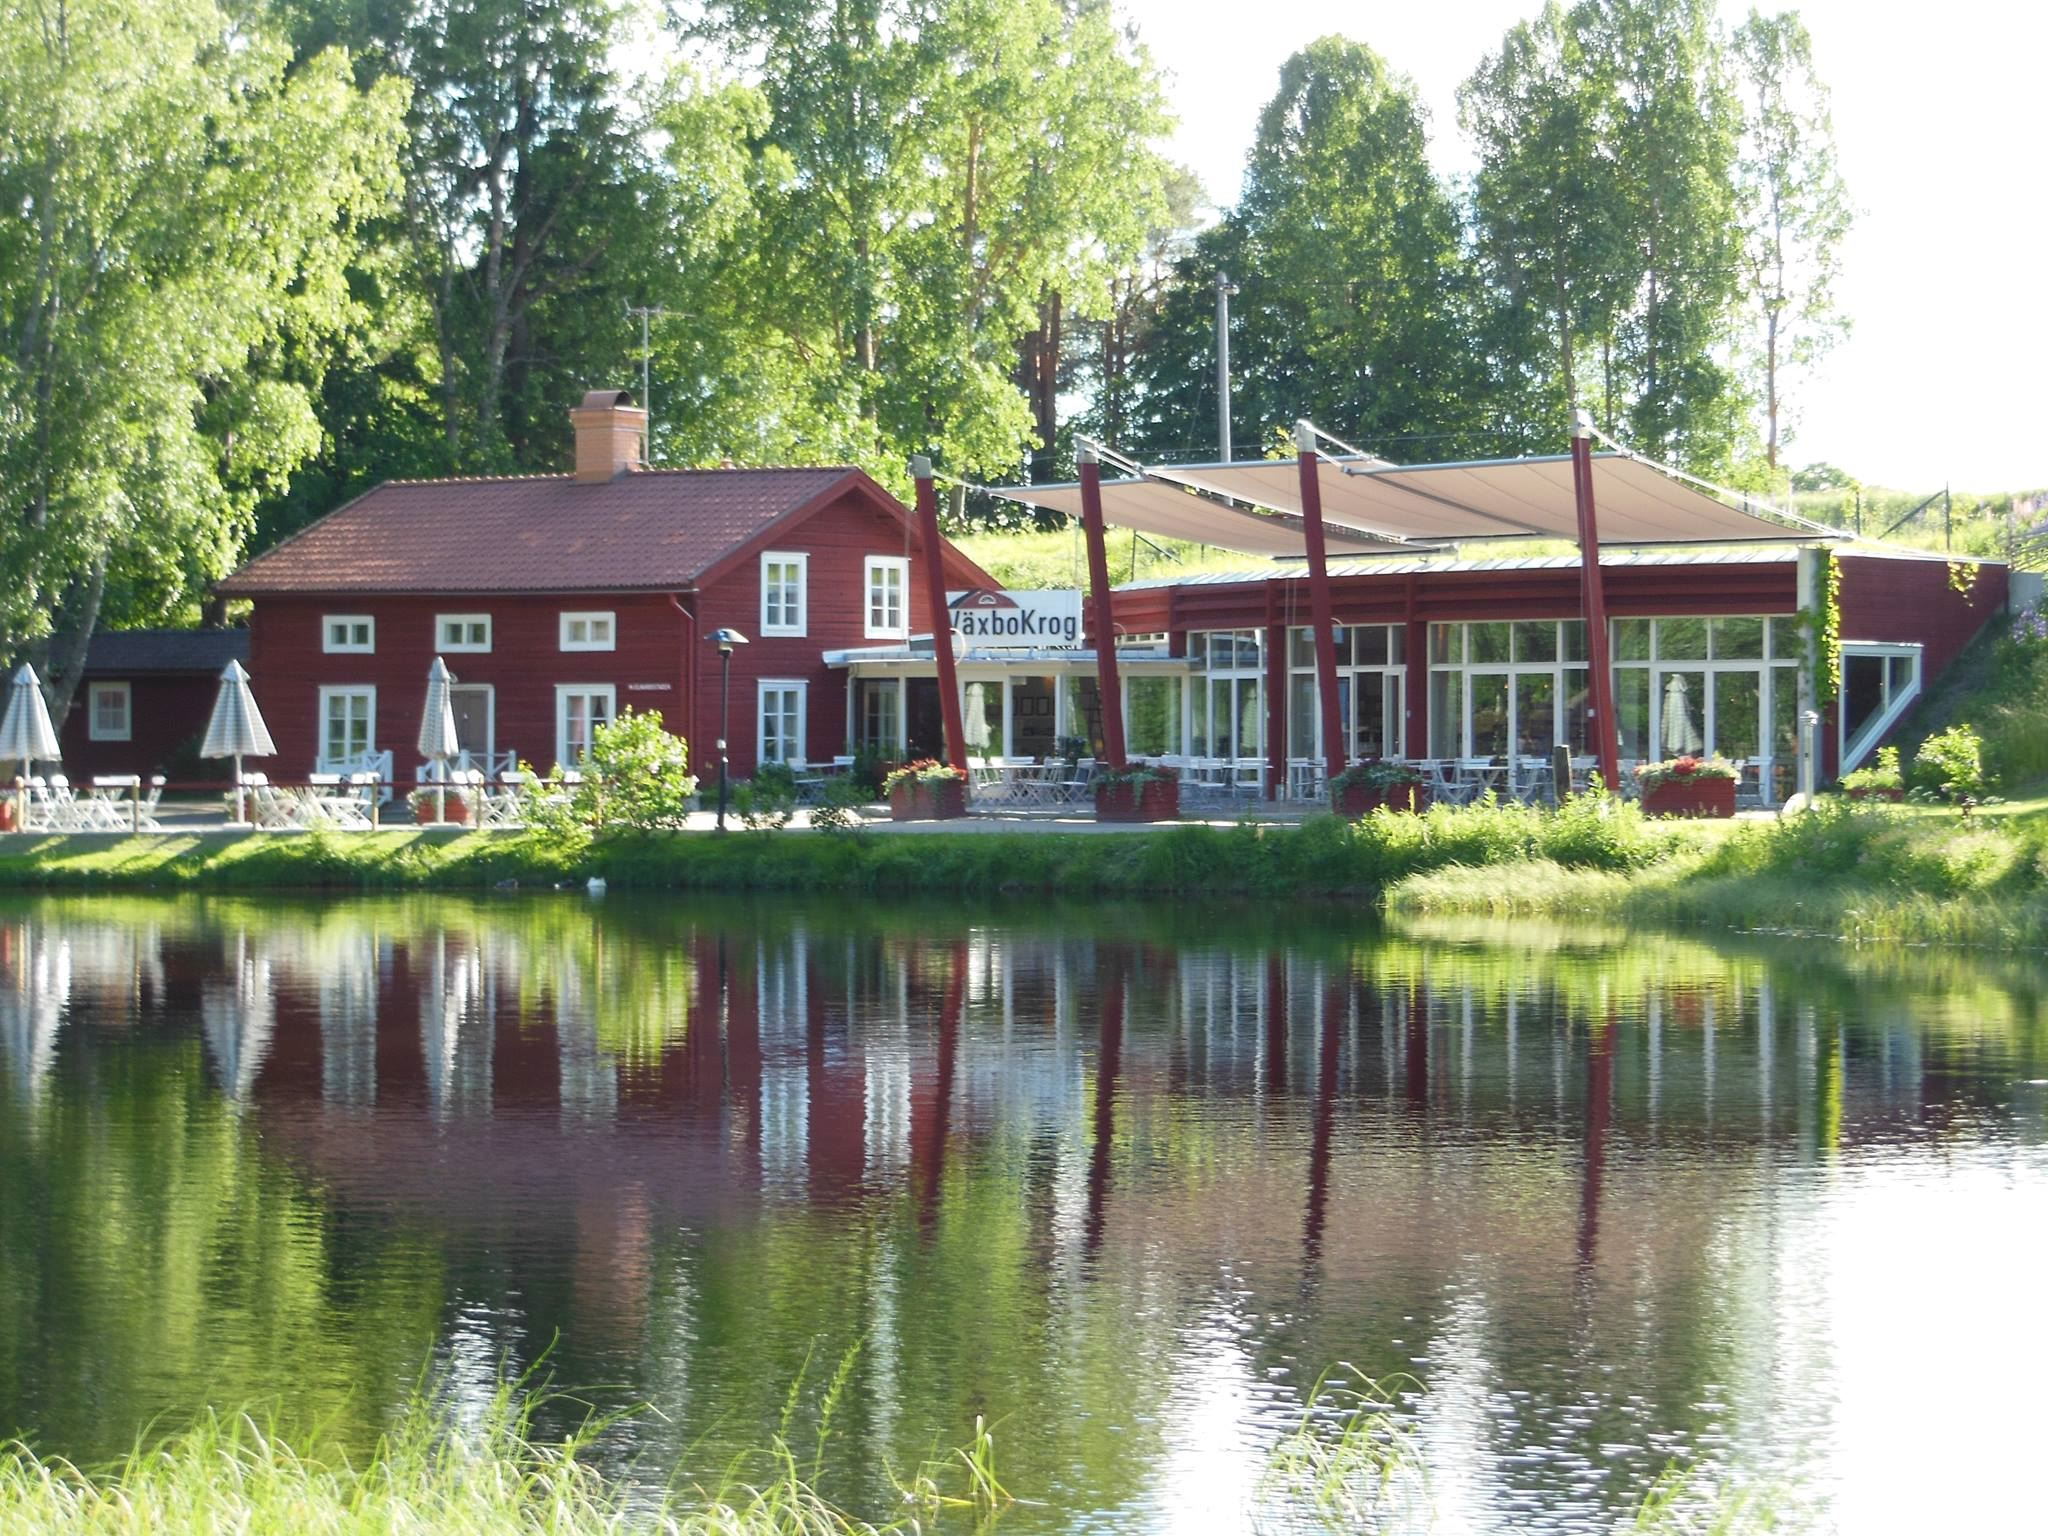 Påsköppet på Växbo Krog